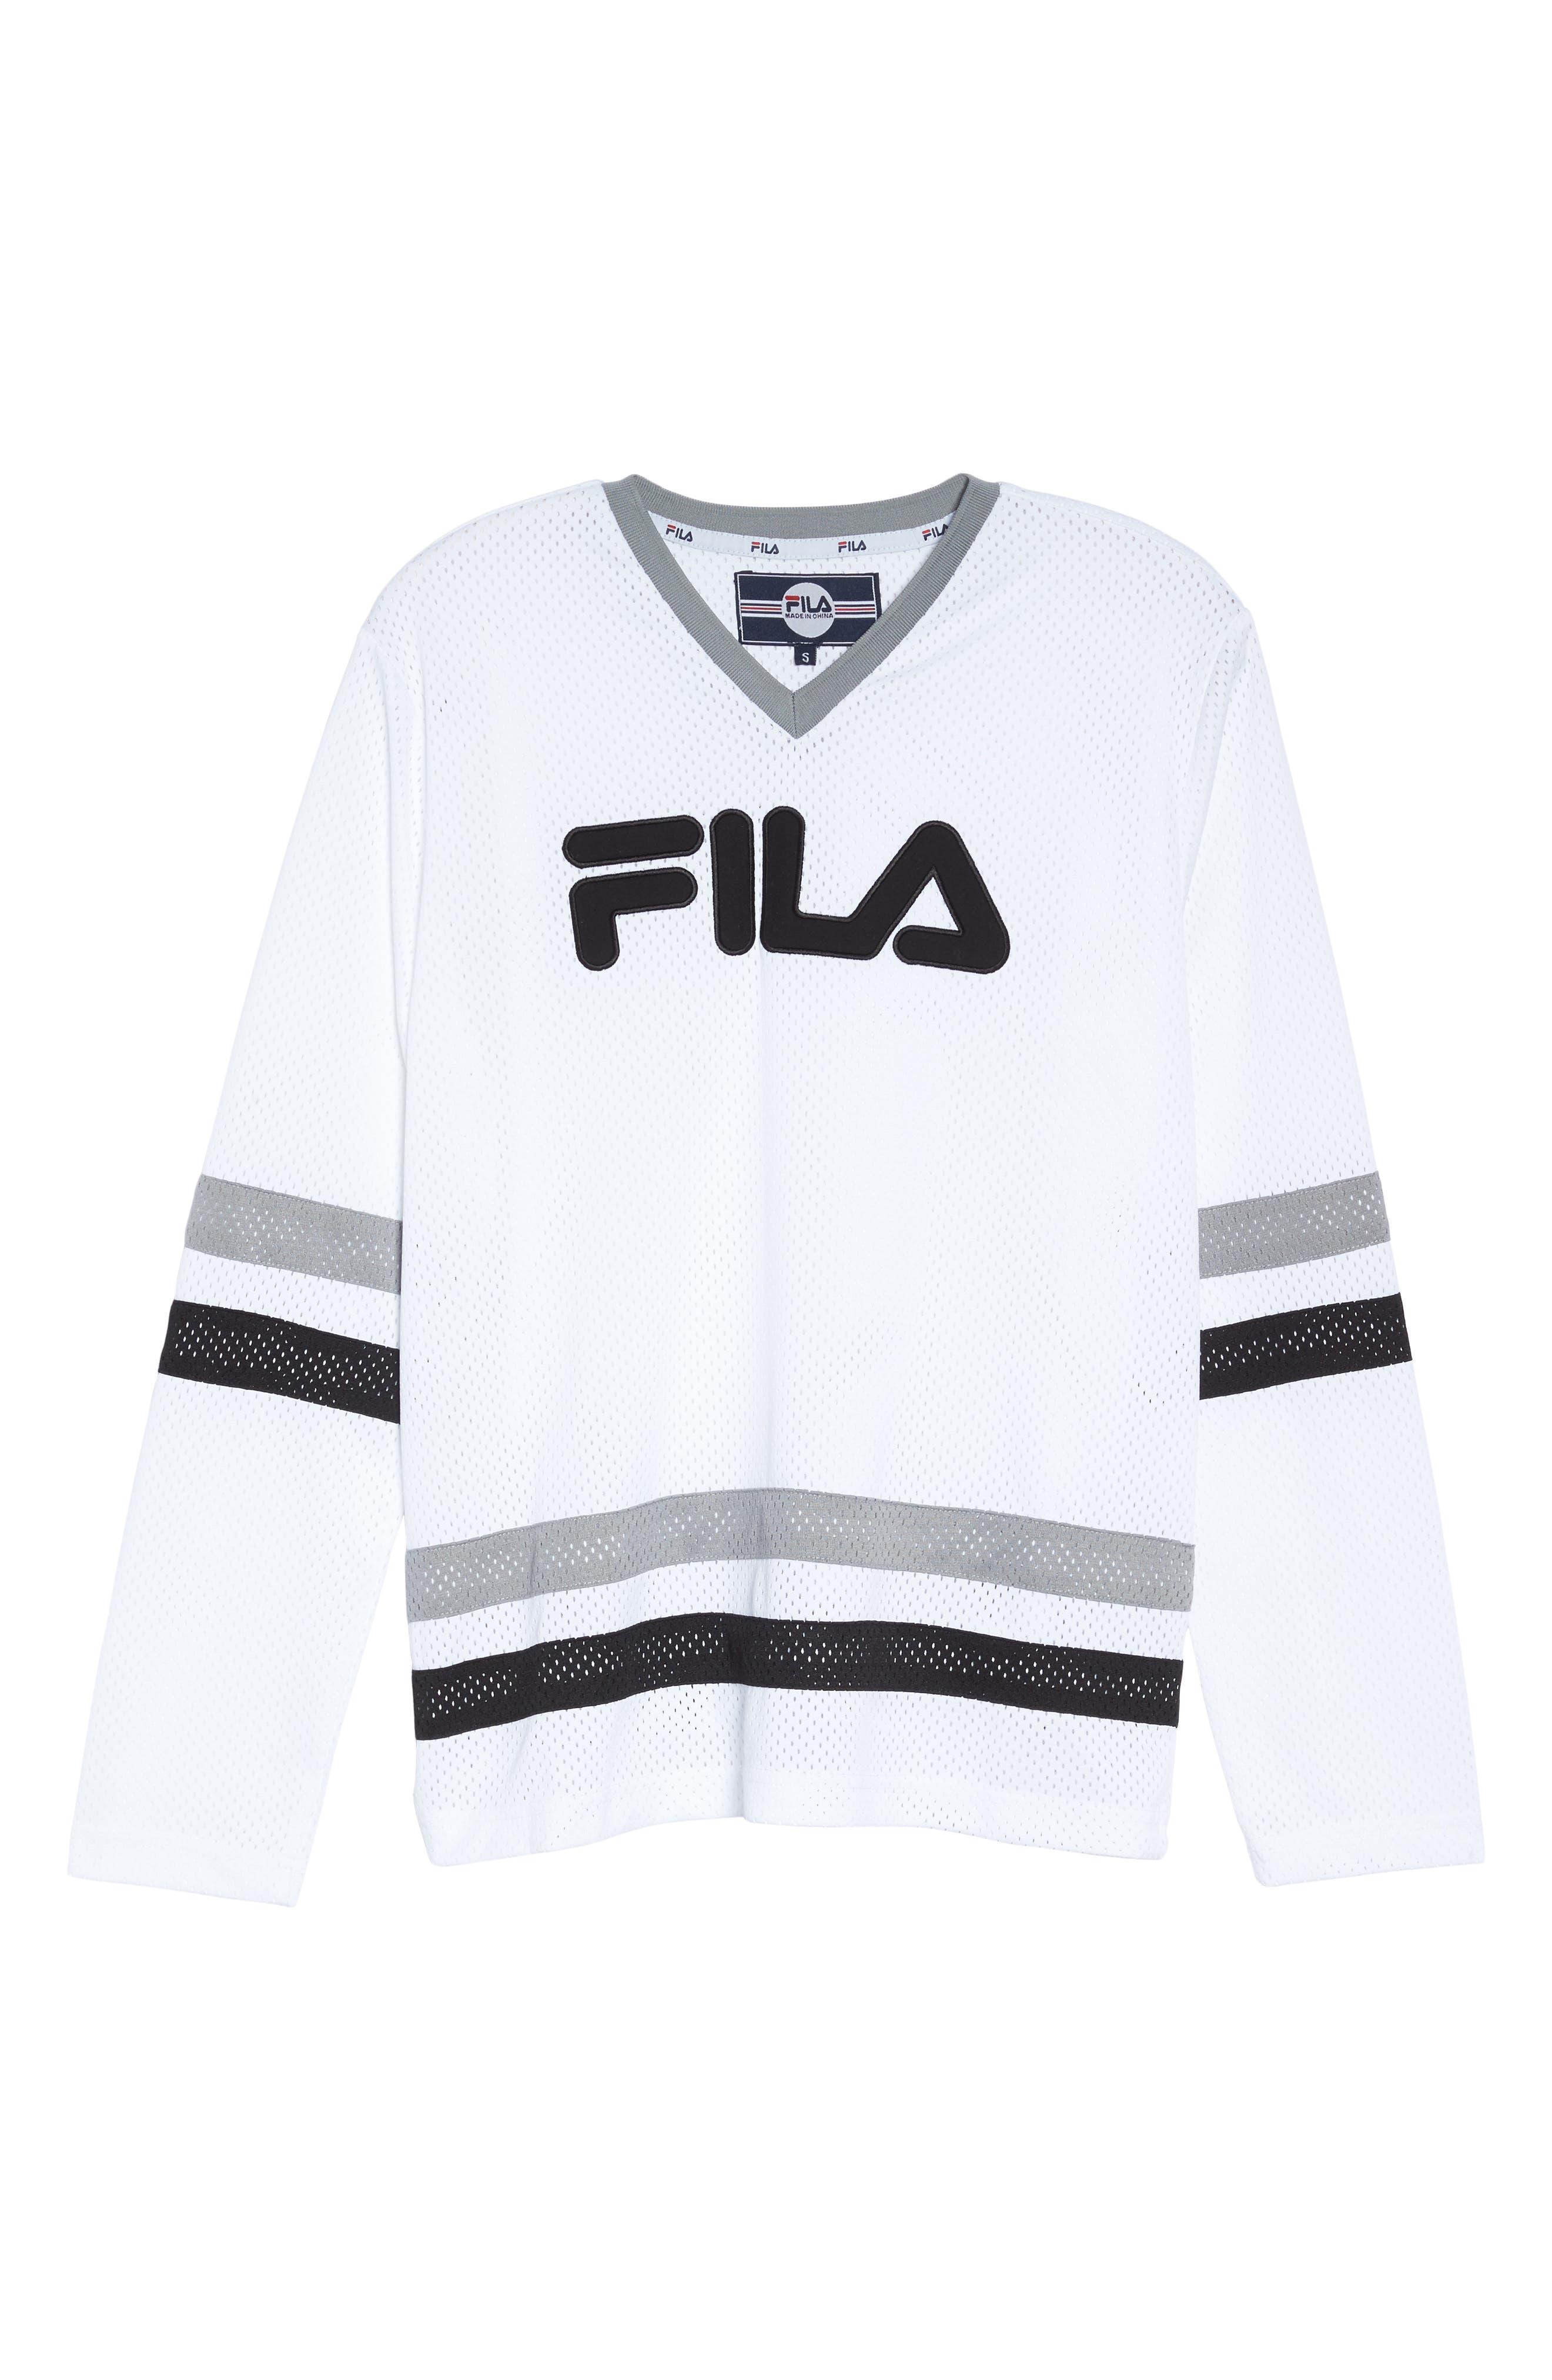 Tanya Hockey Jersey,                             Alternate thumbnail 7, color,                             100